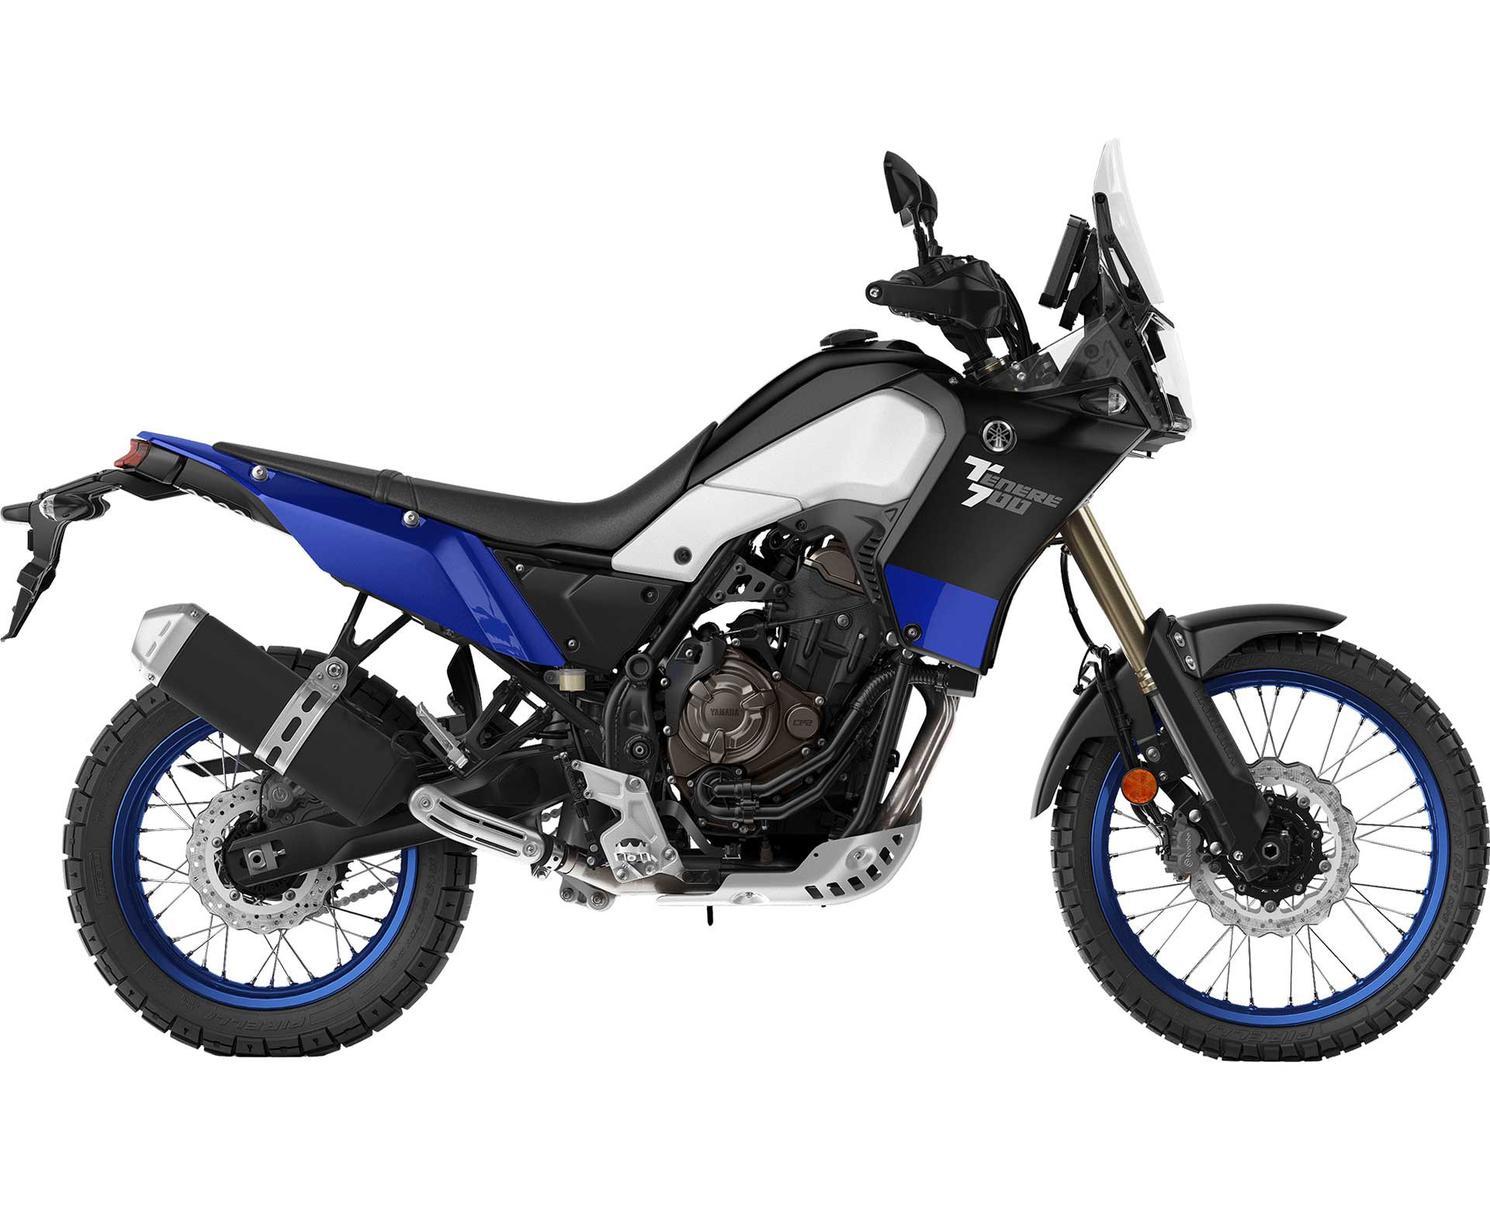 2021 Yamaha Ténéré 700 Blue